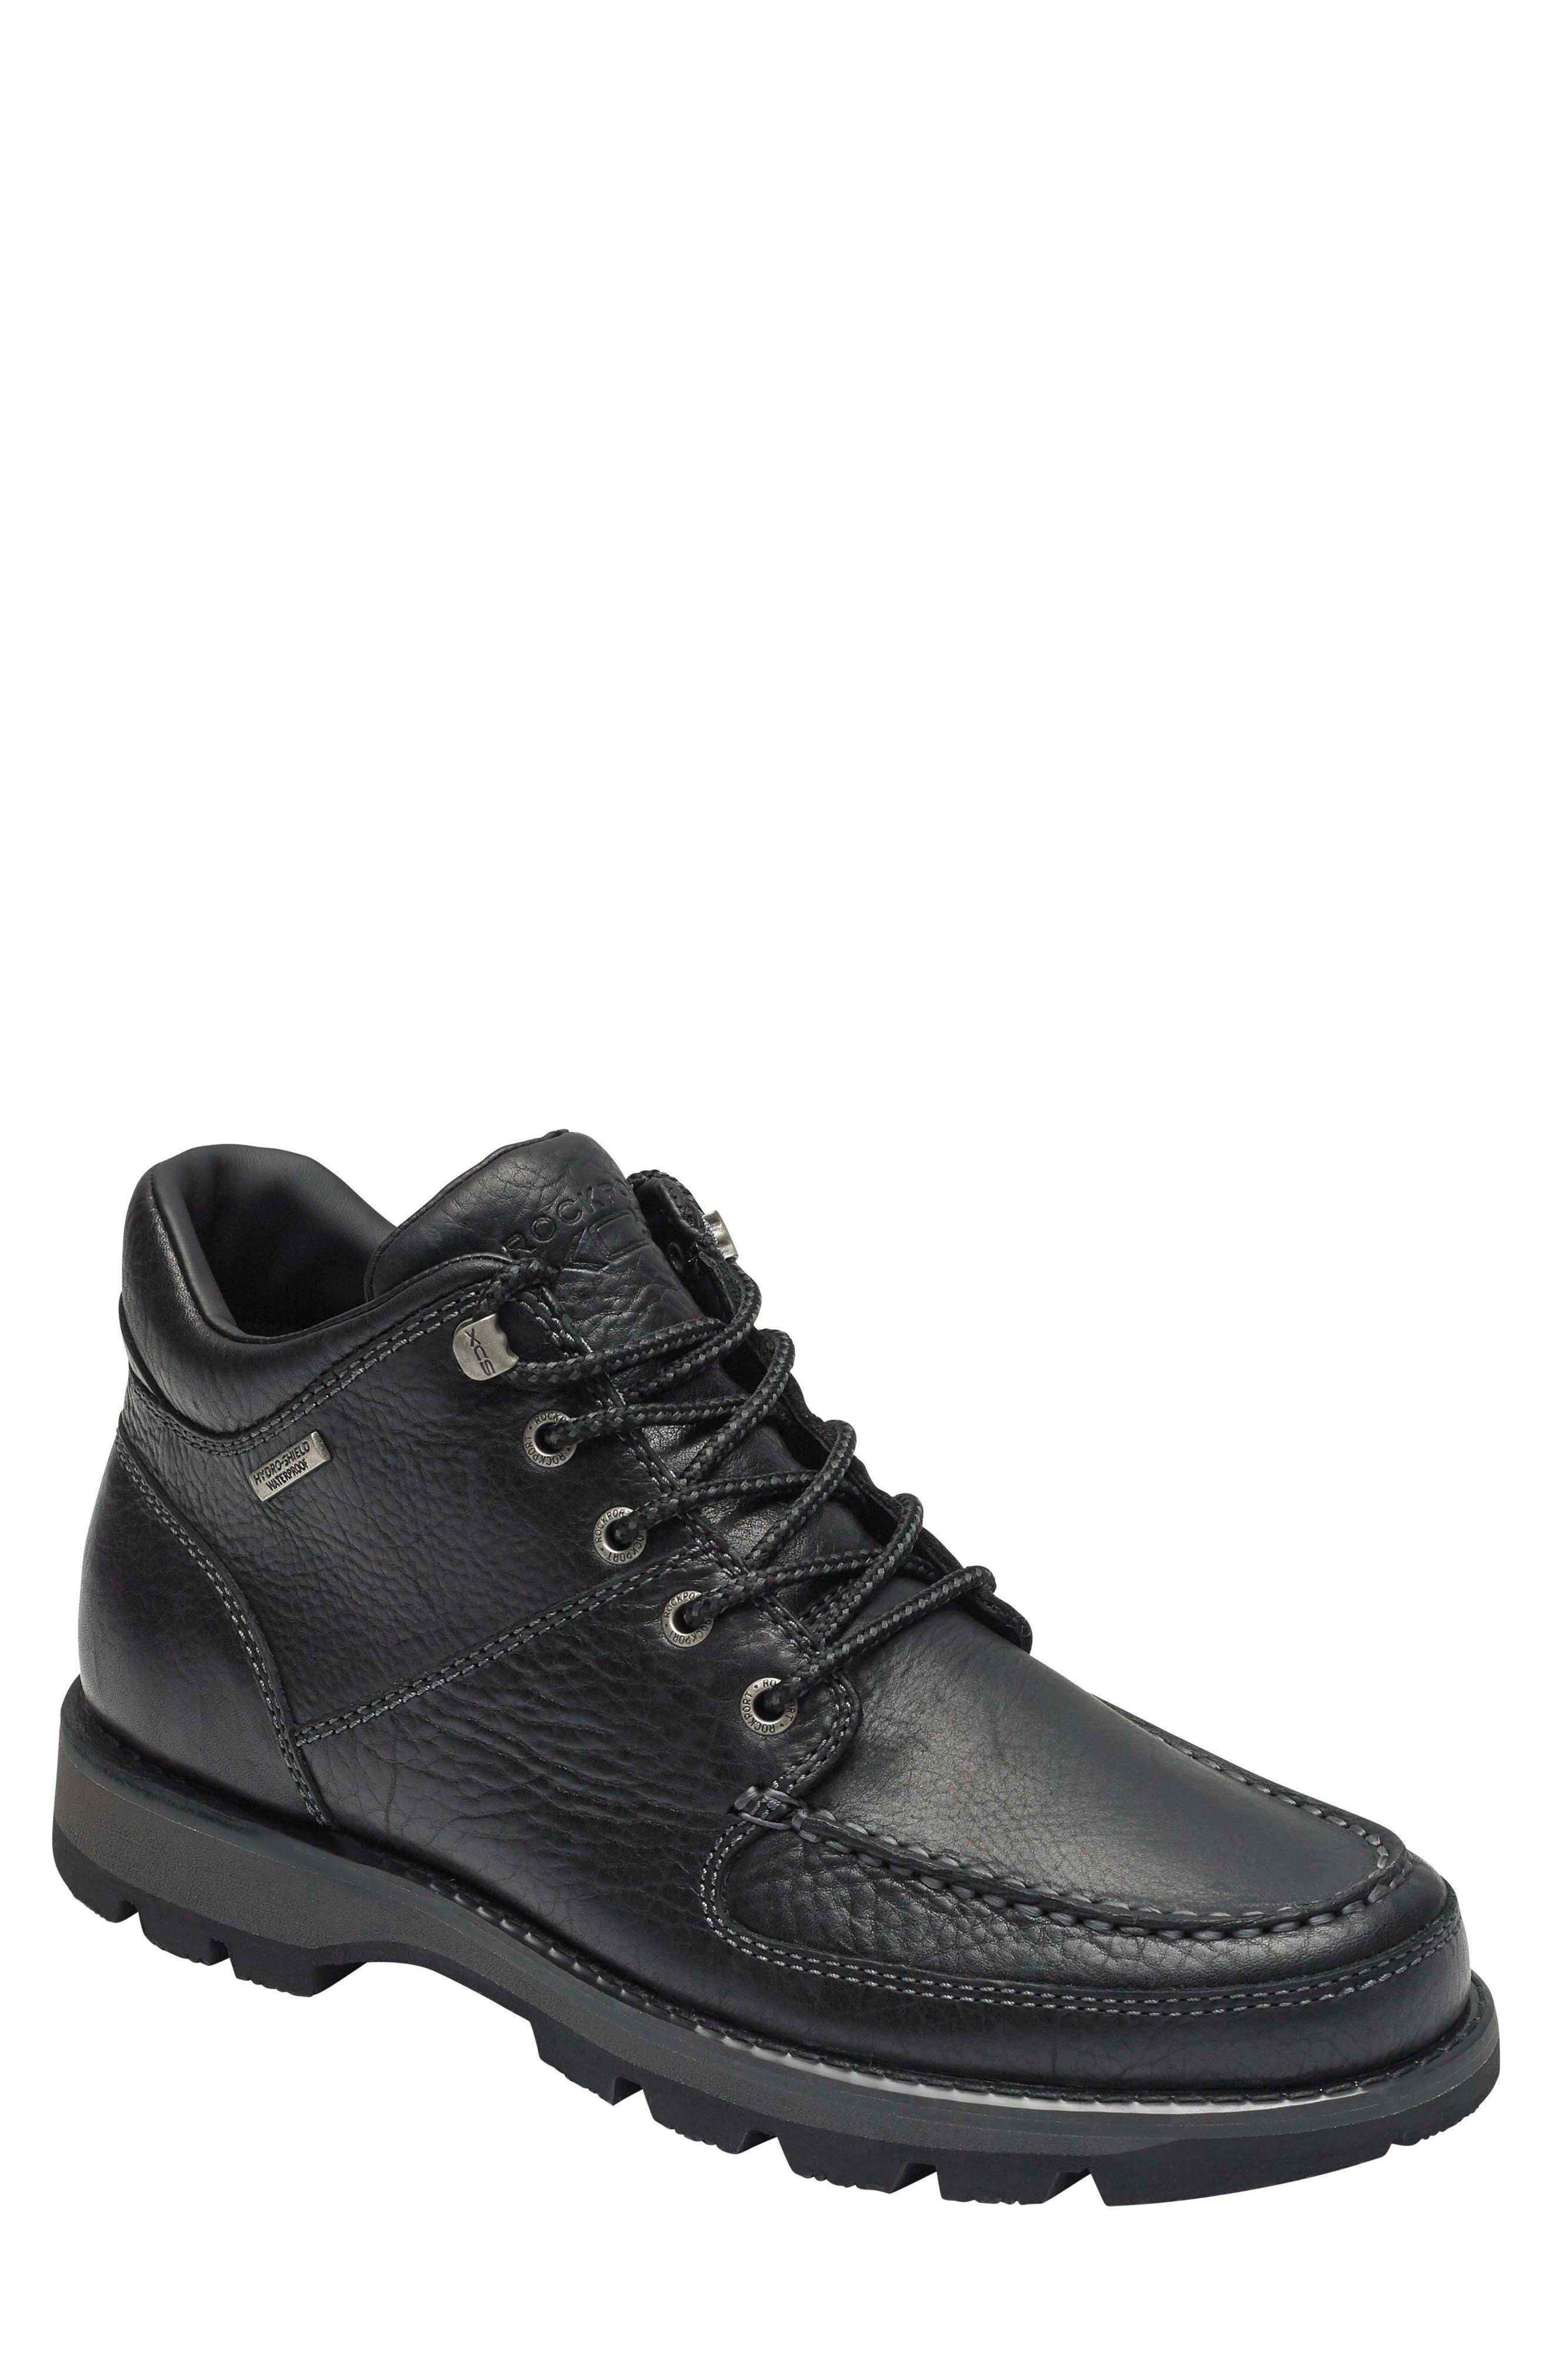 Rockport Umbwe Ii Waterproof Boot, Black